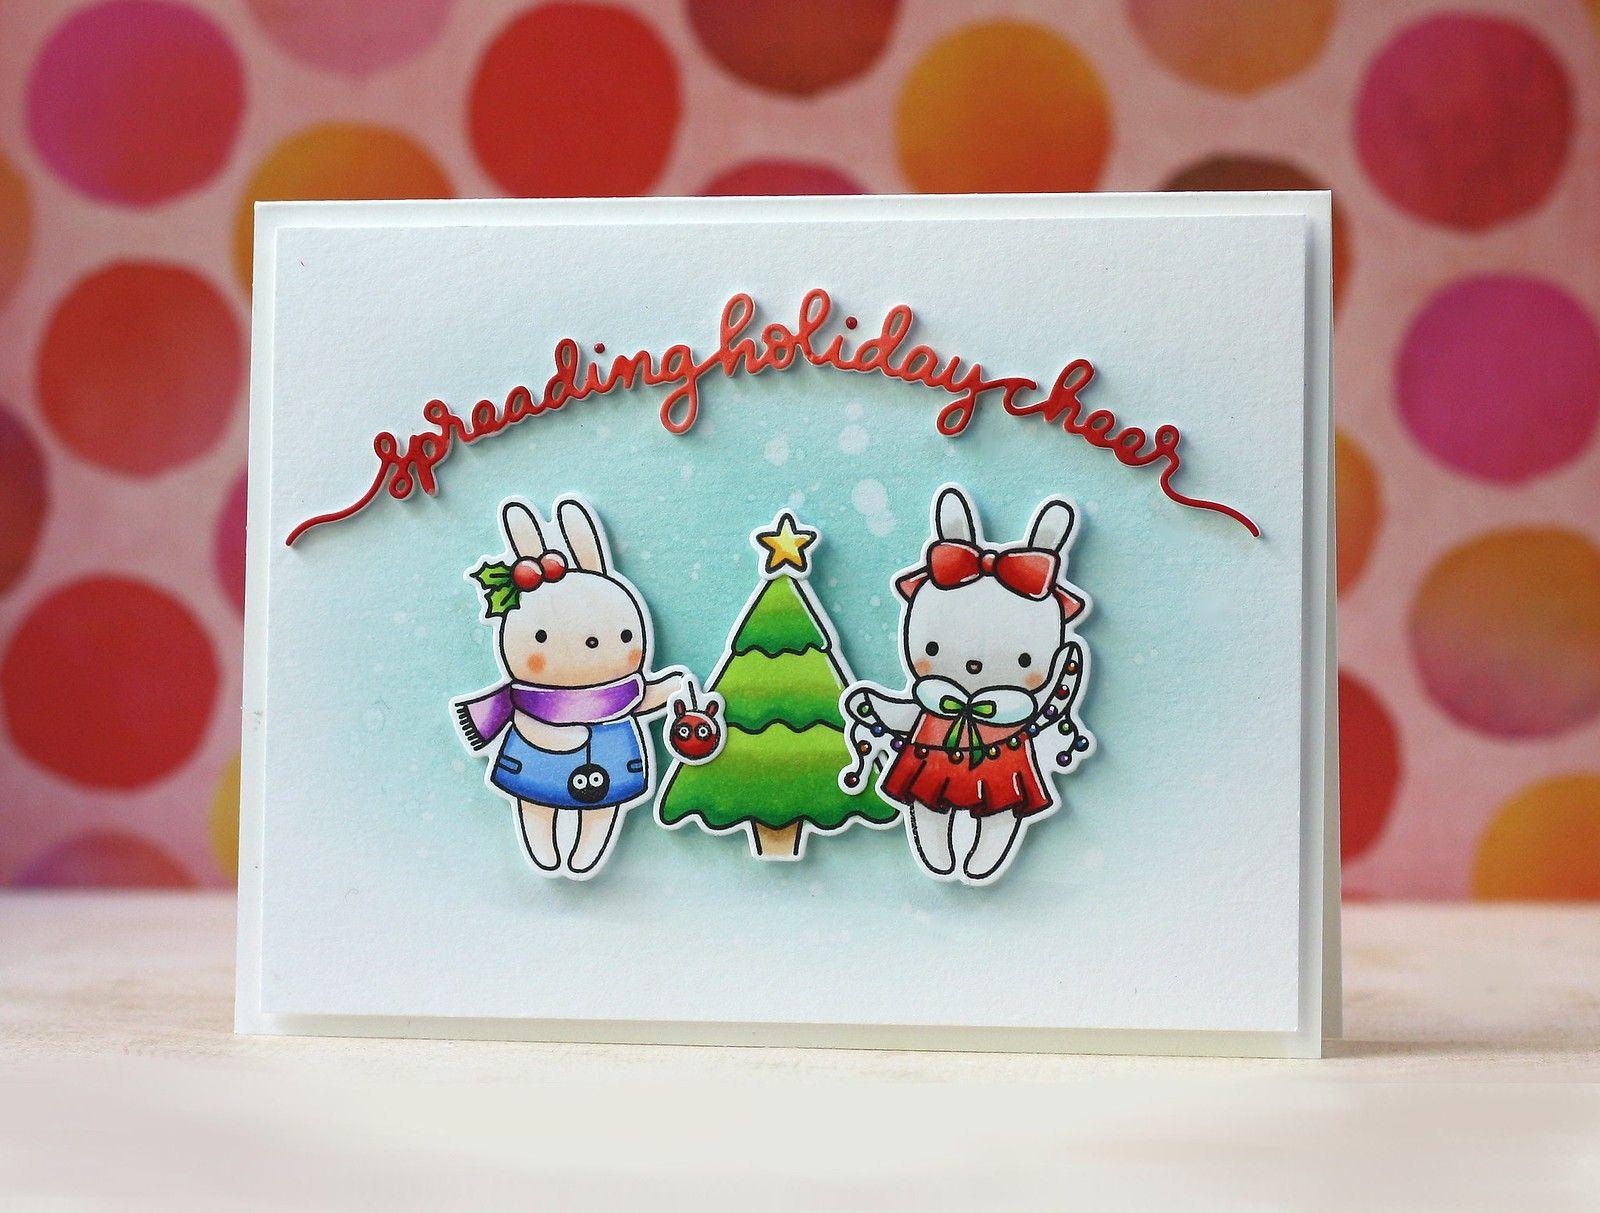 mama elephantpix's happy holiday  christmas card design